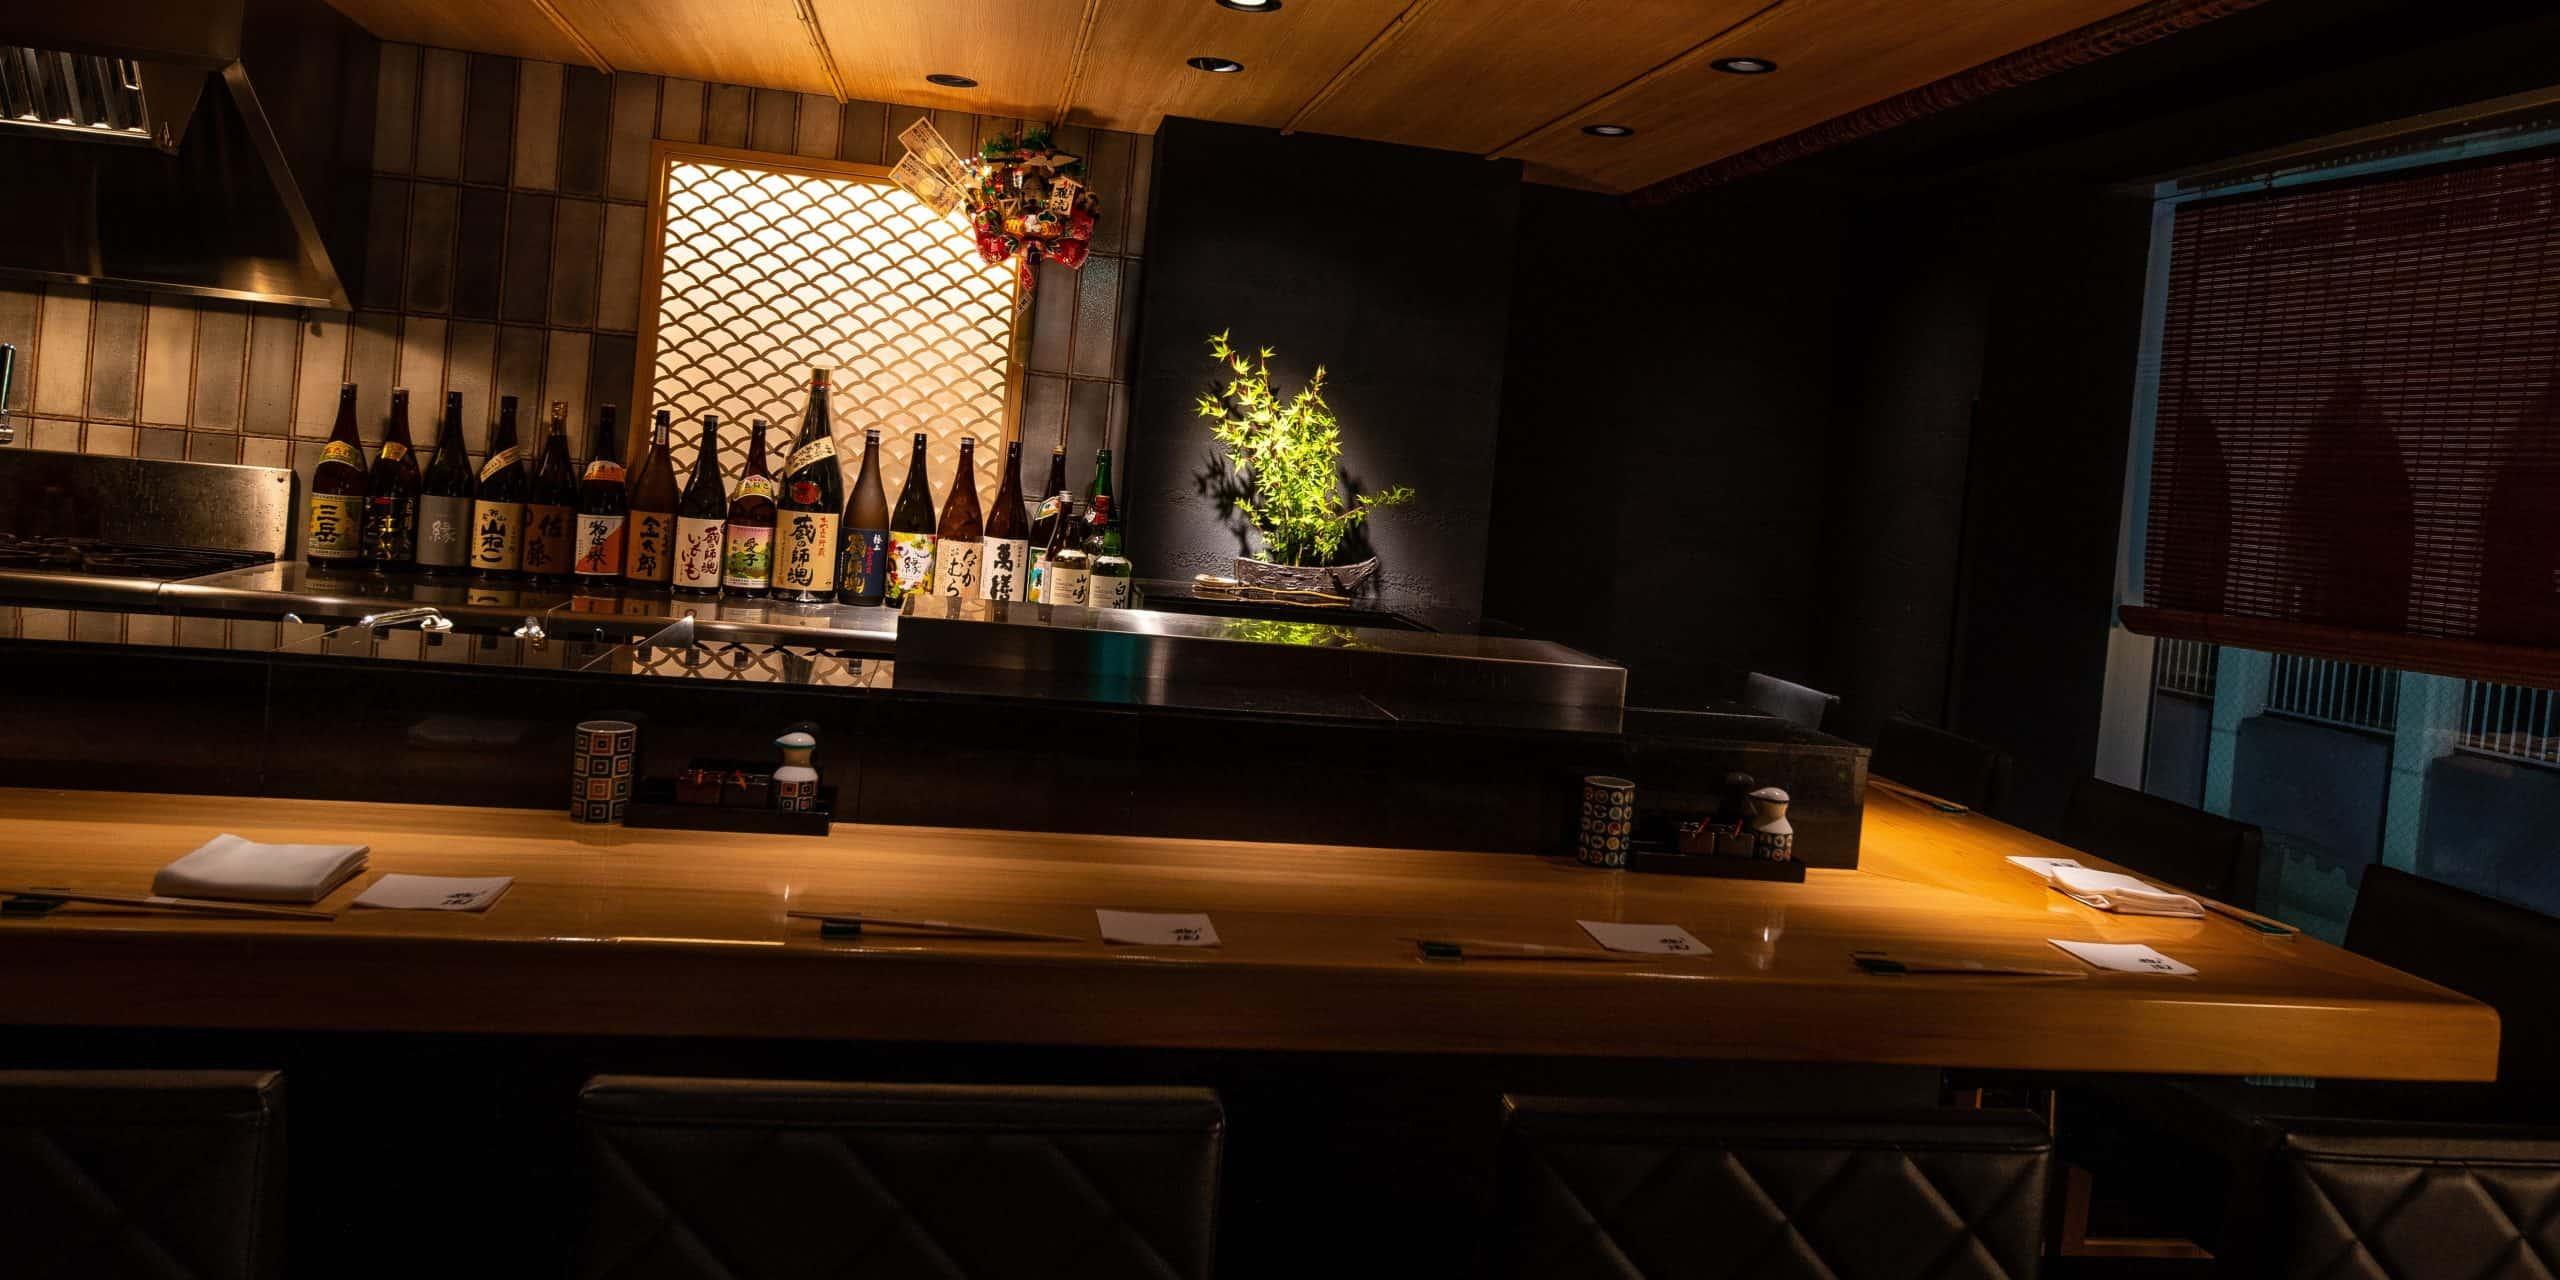 visit the Hashuku restaurant